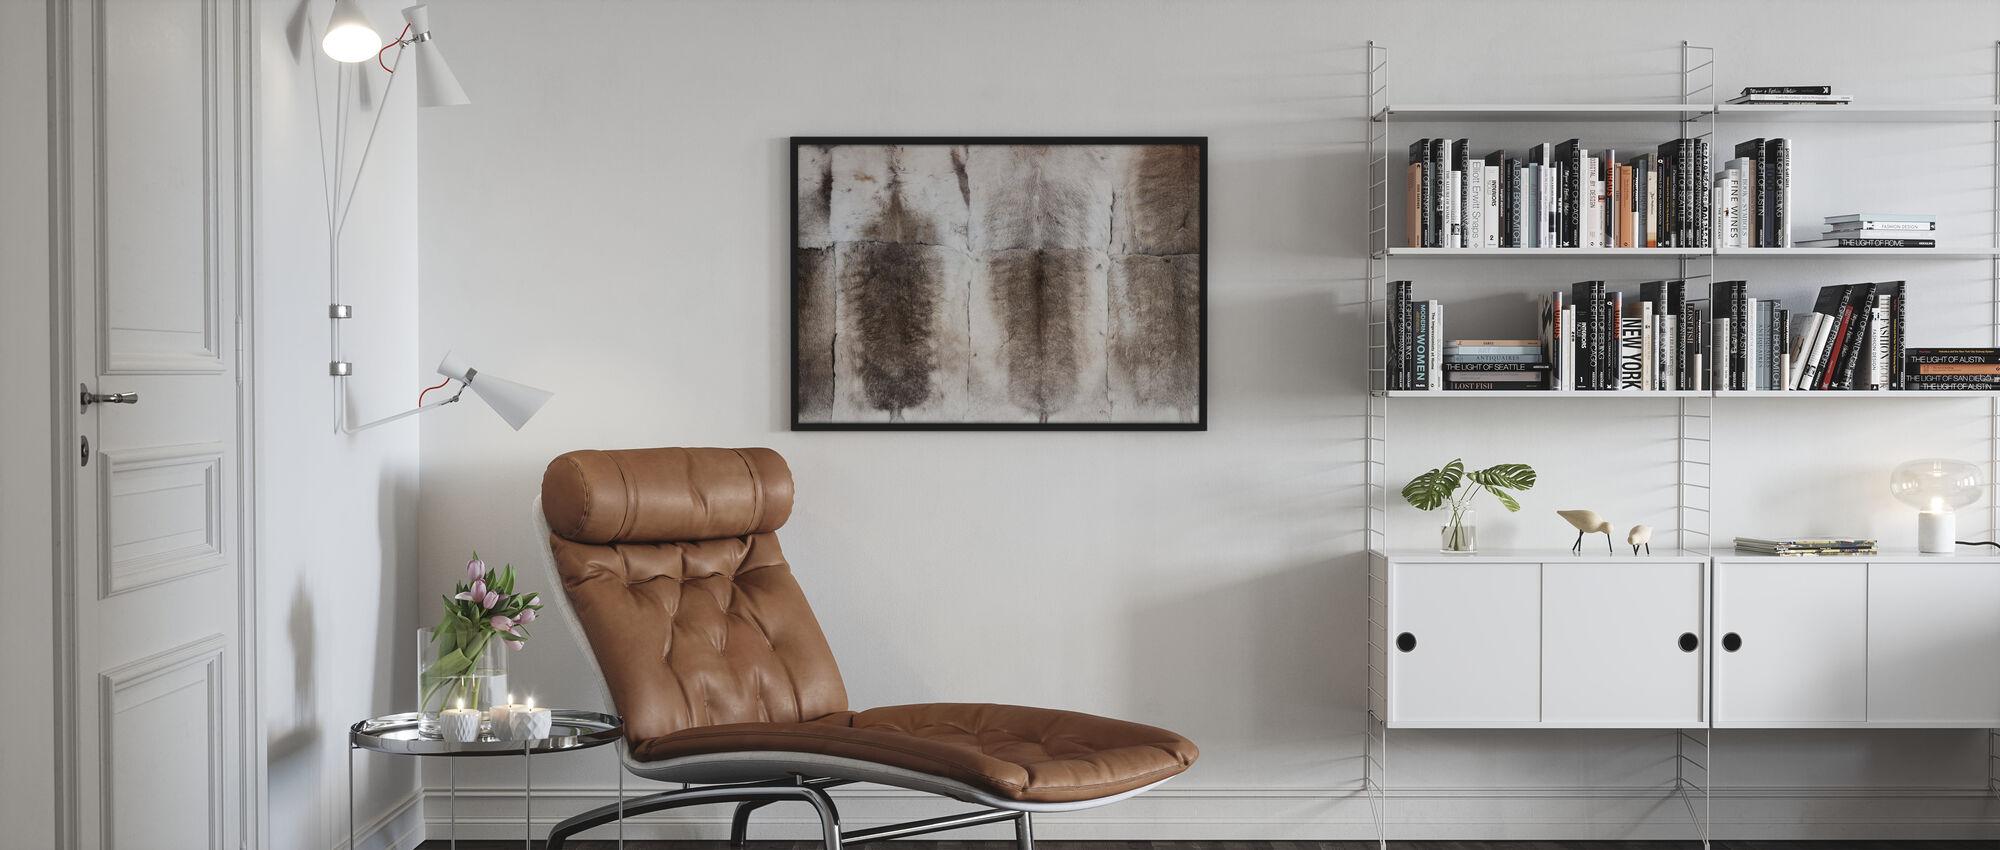 Reindeer Fell - Poster - Living Room